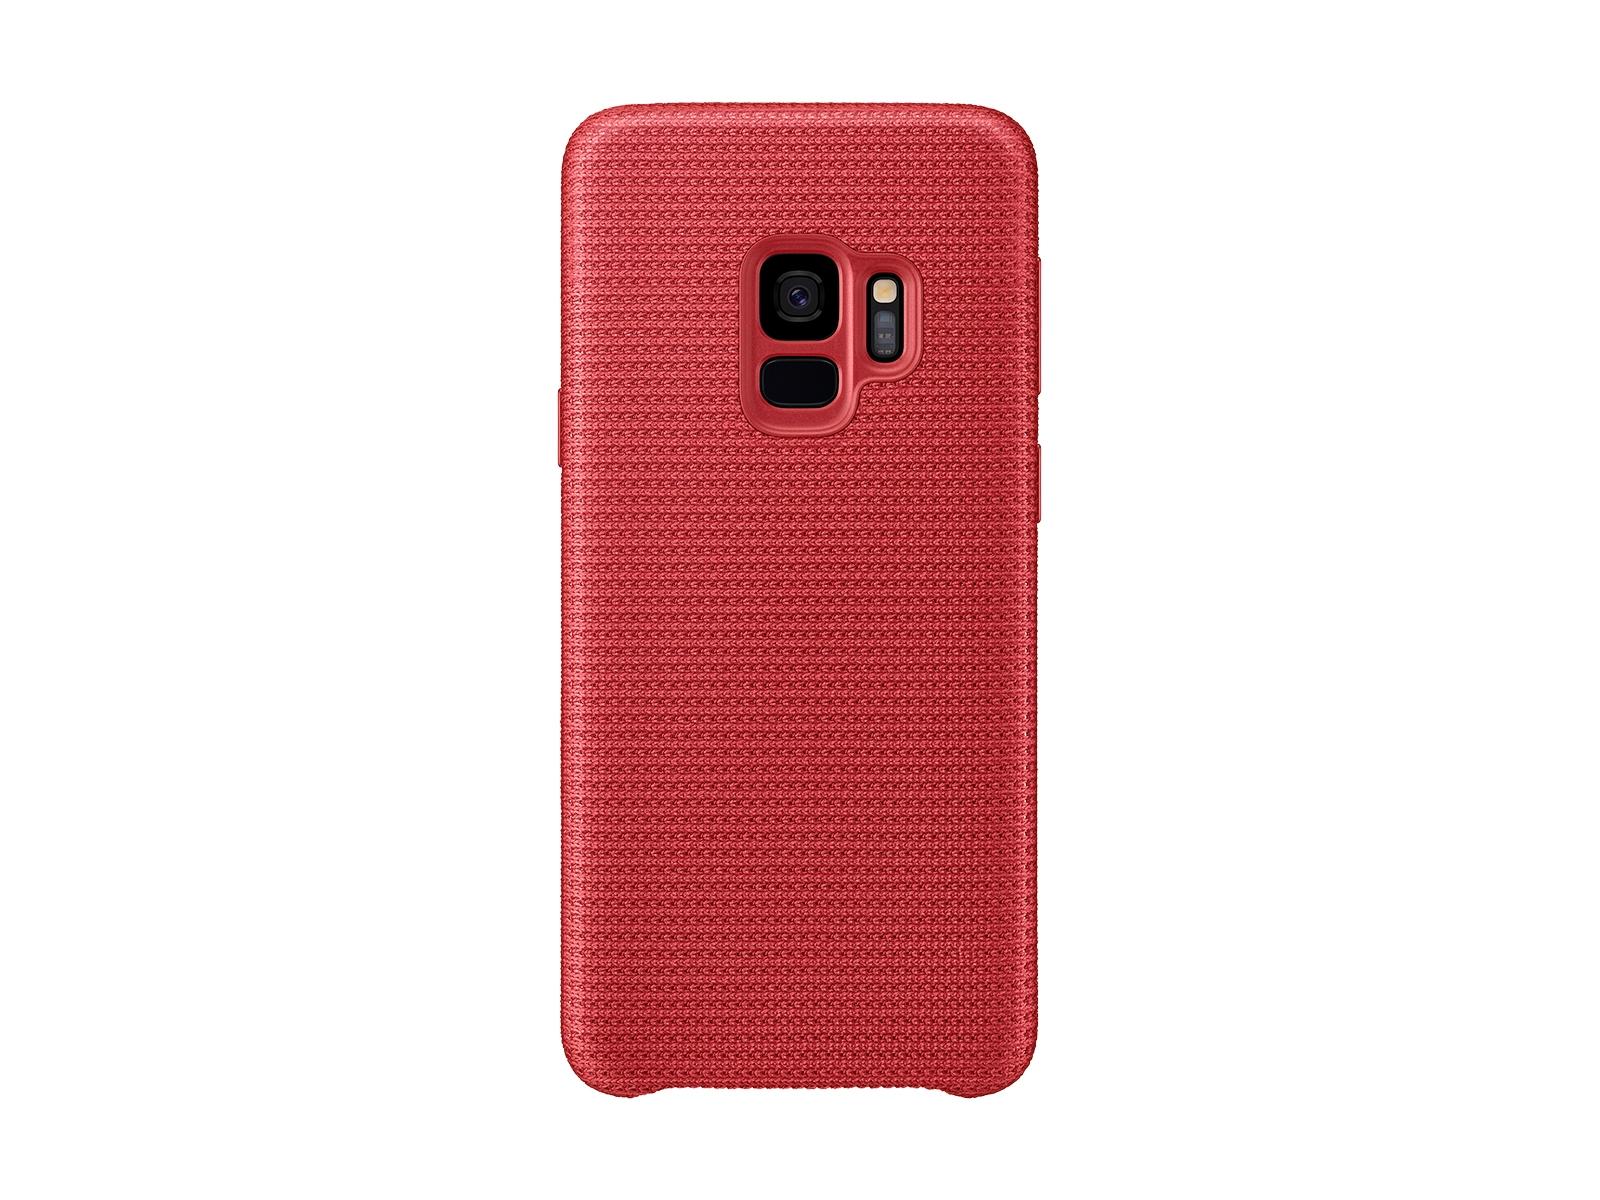 Galaxy S9 Hyperknit Cover, Red